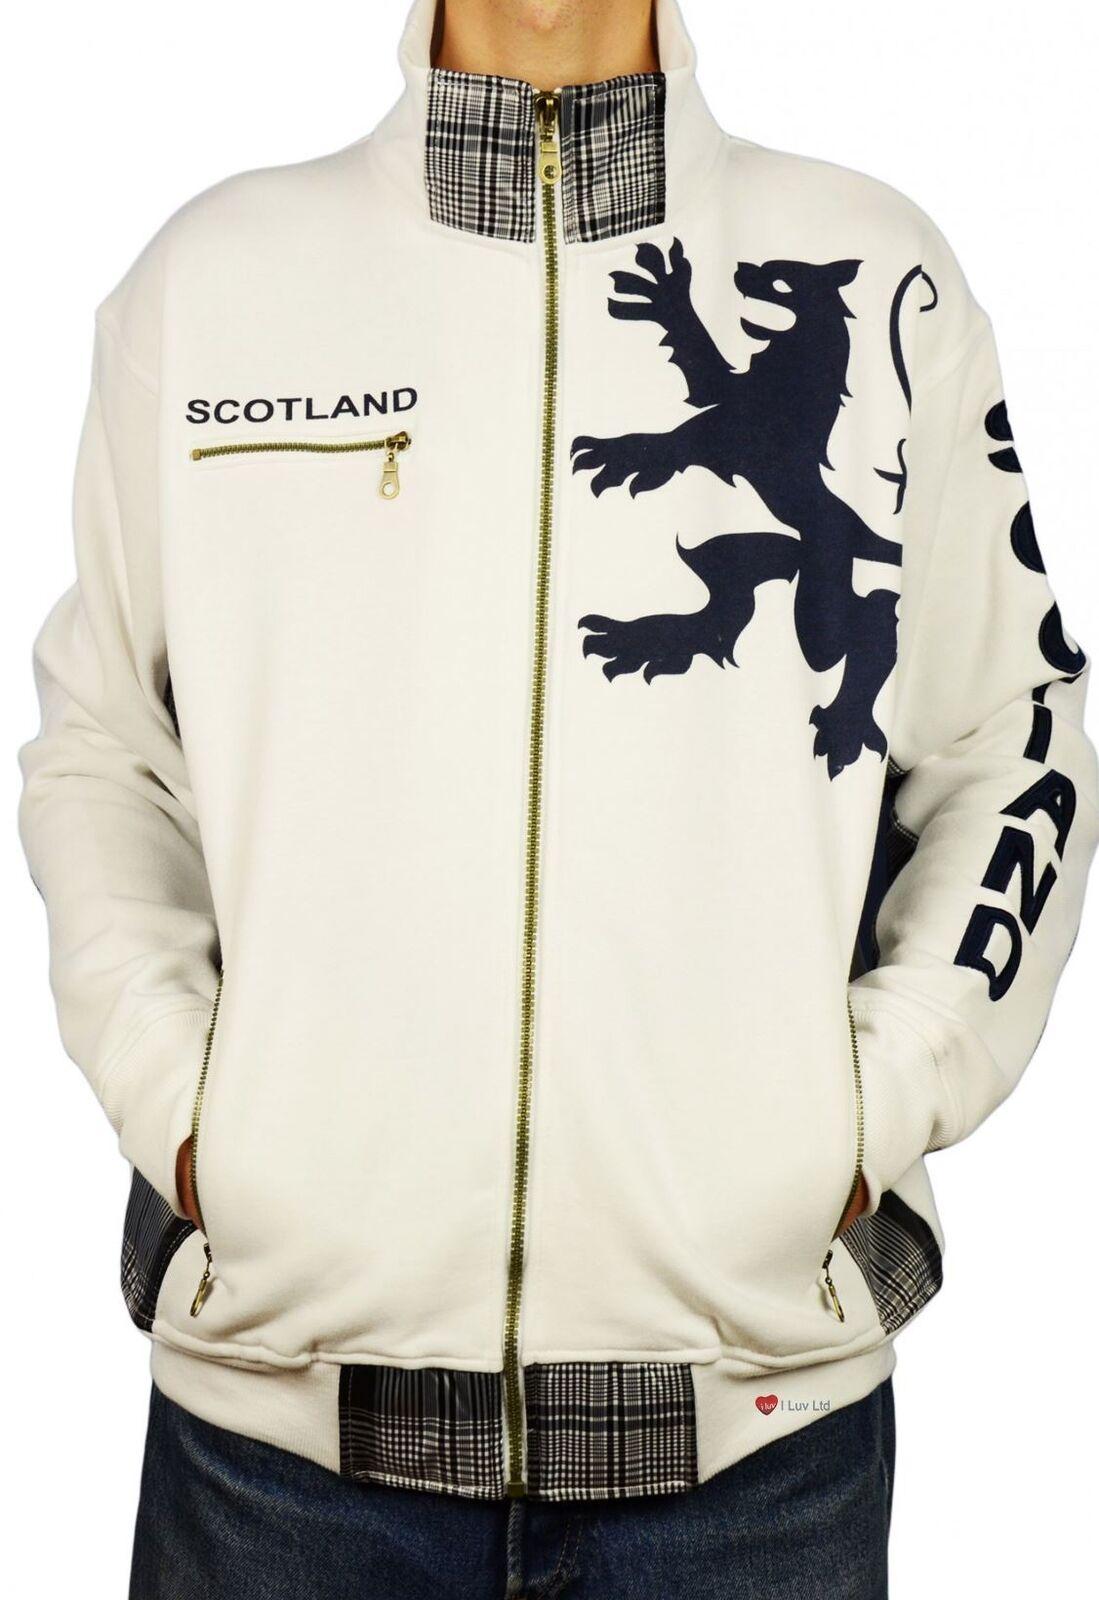 Herren Zipper Top Scotland Lion Tartan Insert Weiß Größe 2X-Large